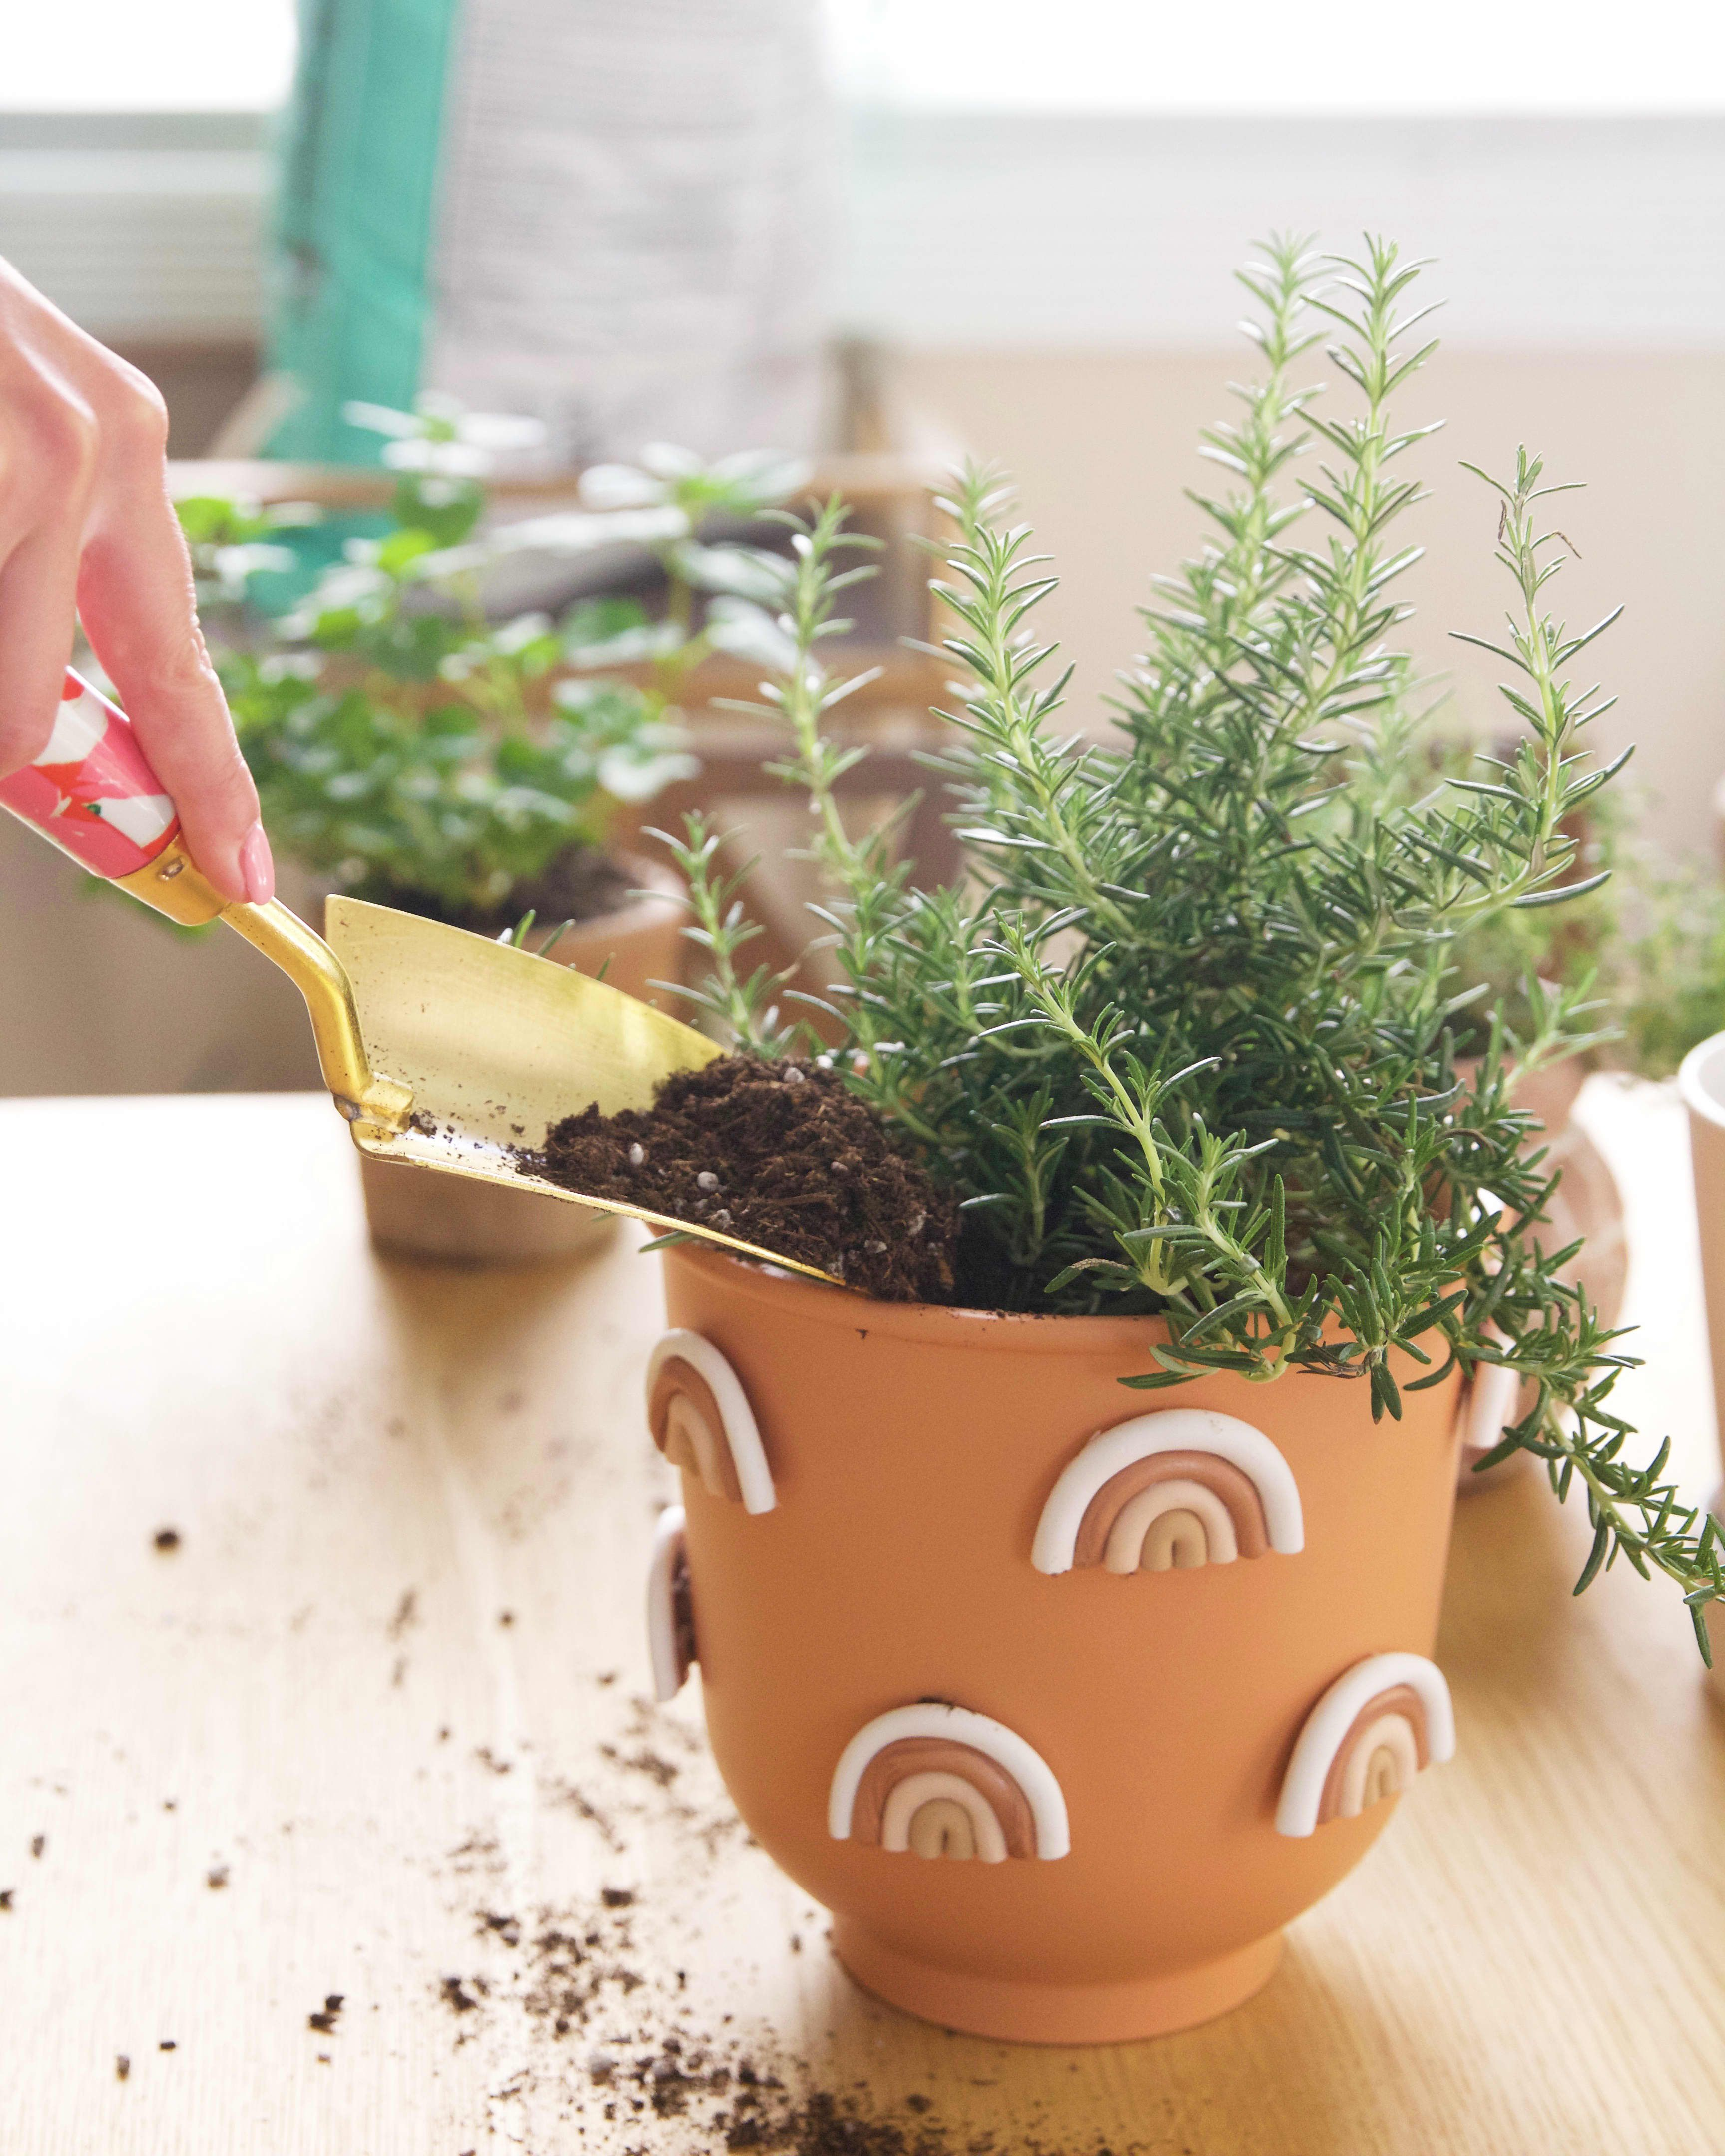 How To Grow Herbs Indoors Growing Herbs Indoors 400 x 300